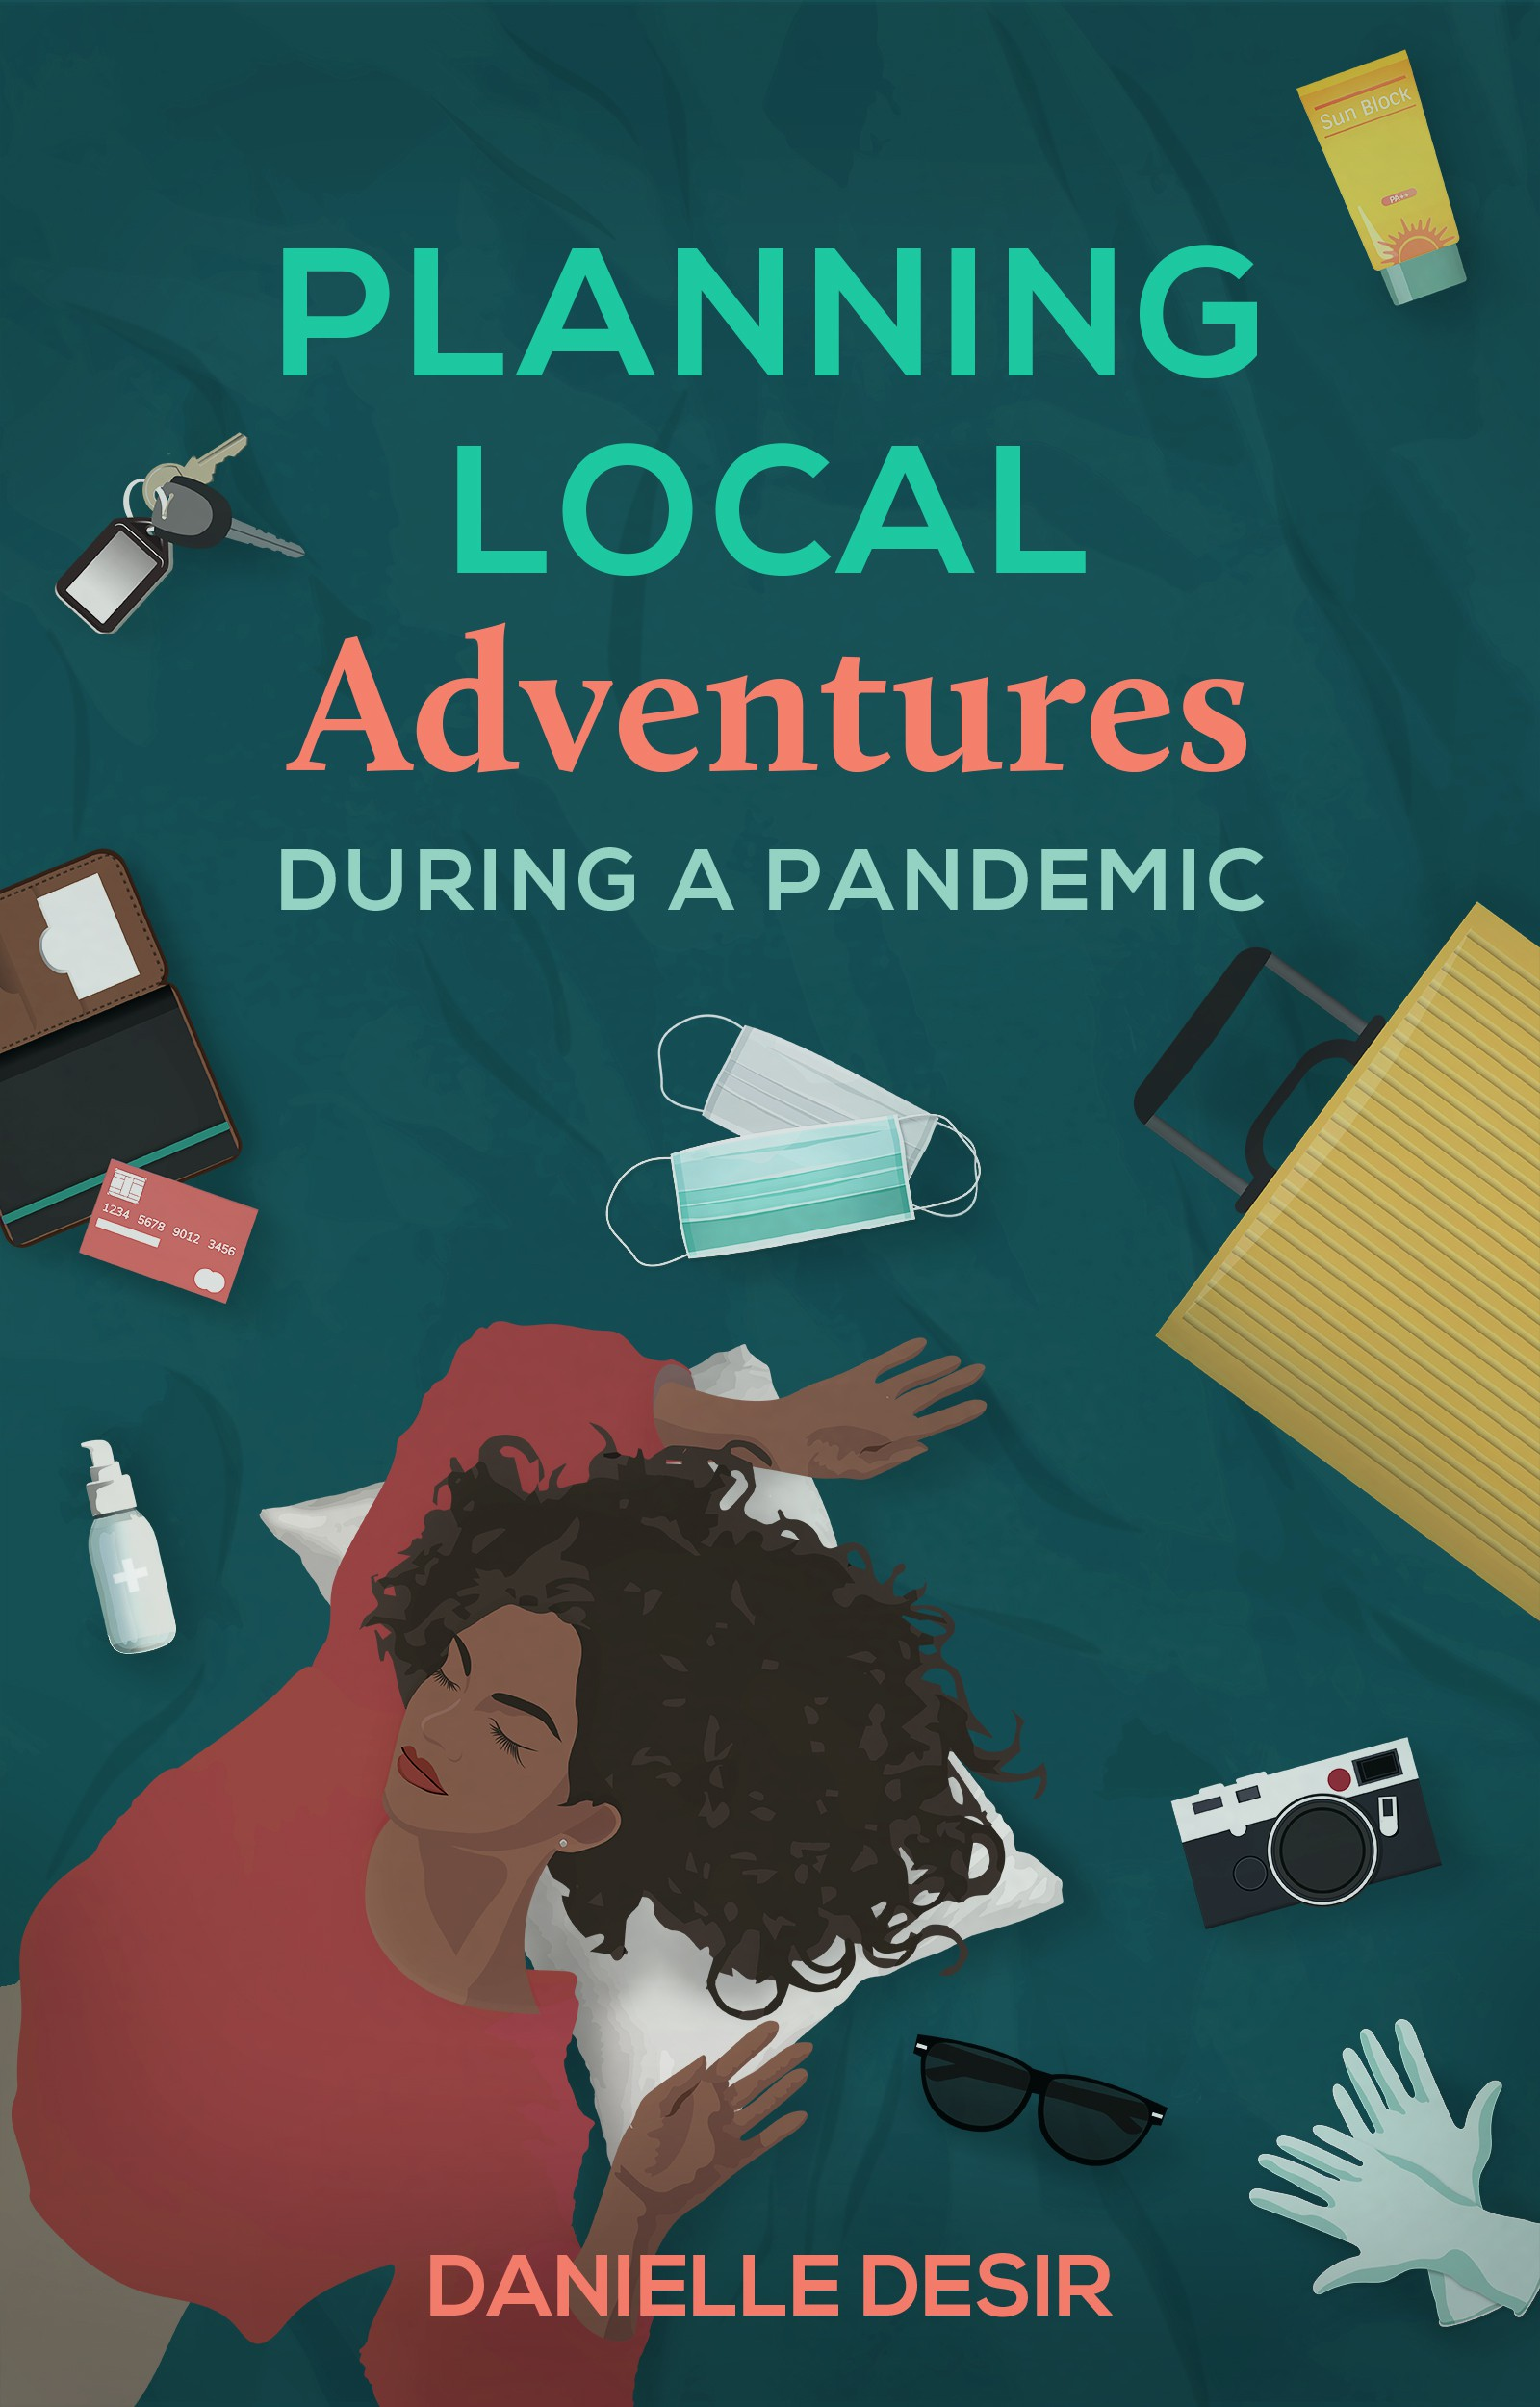 Fun Cover Design For Travel Ebook!